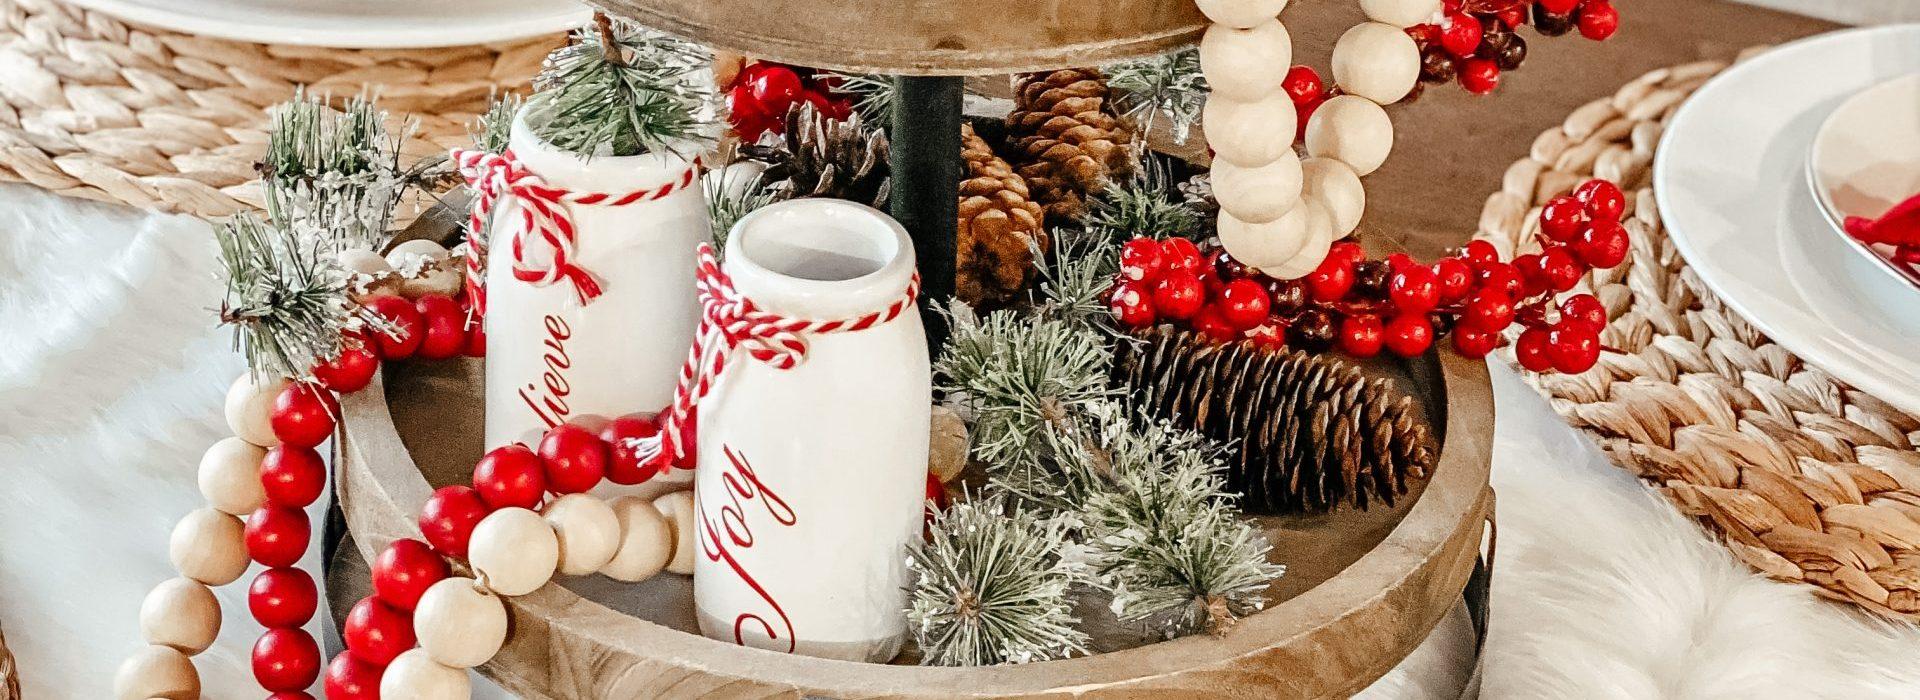 Our Christmas Decor 2020